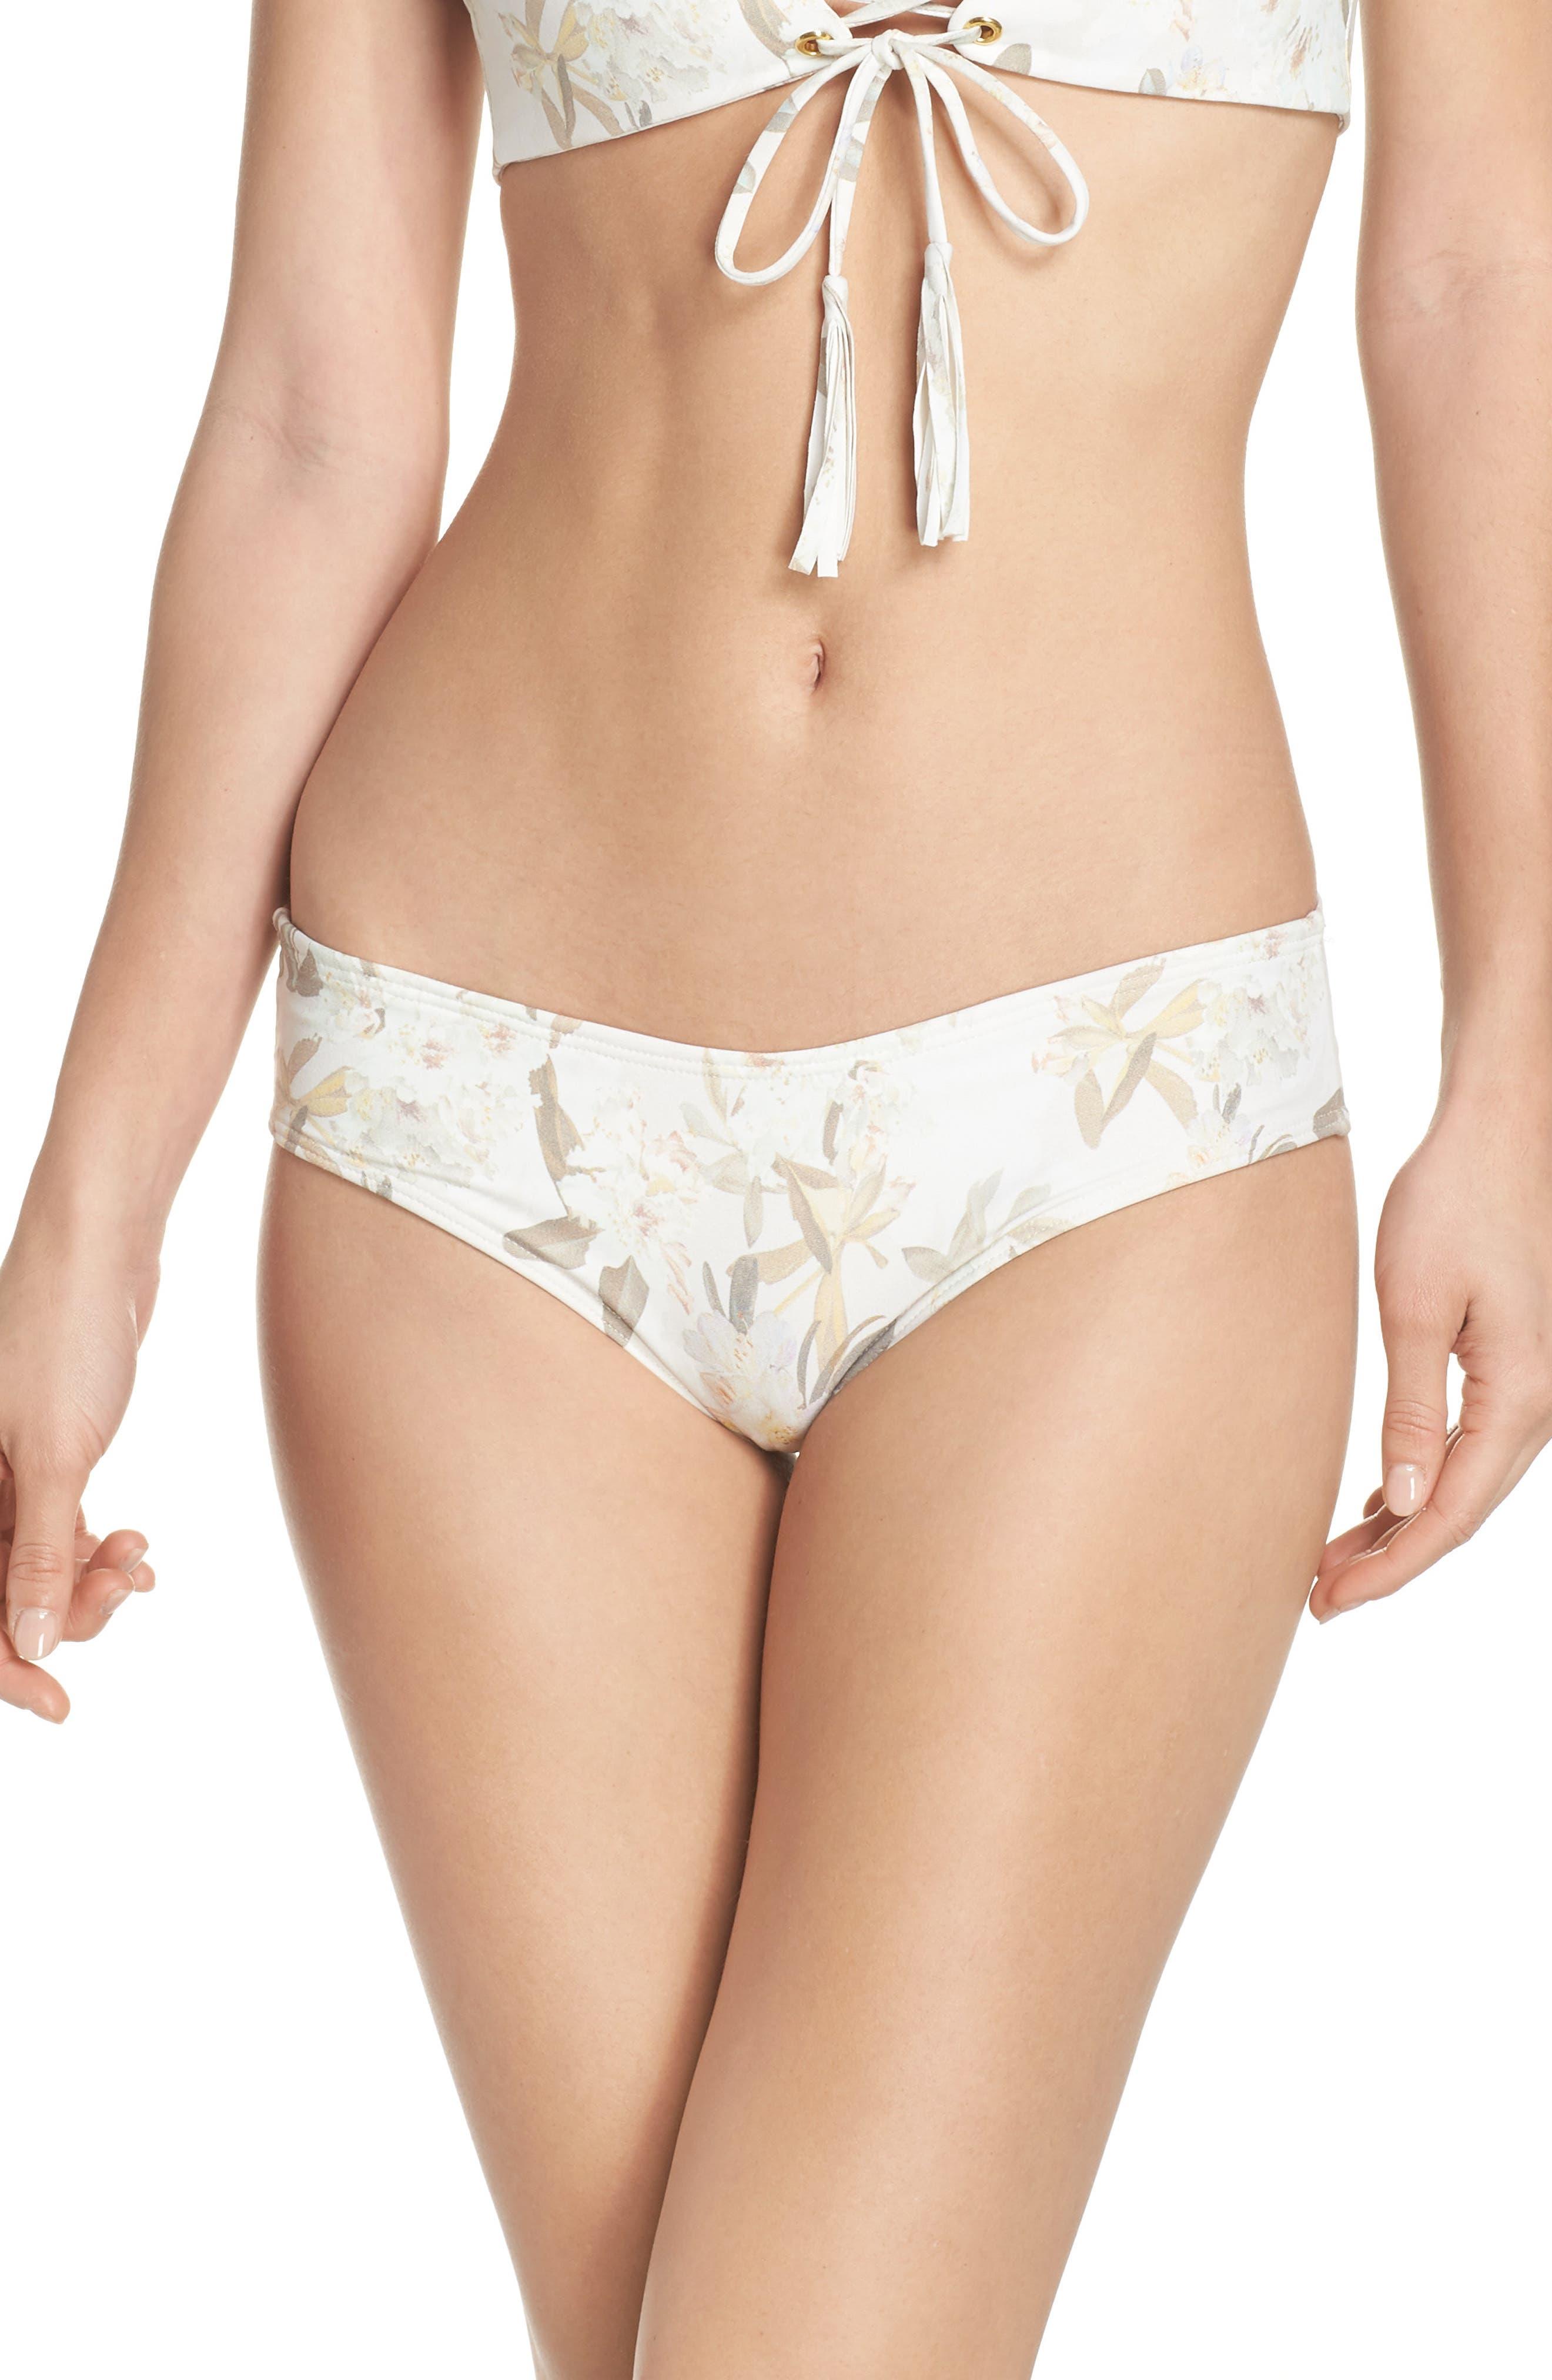 AC Nu Micro Bikini Bottoms,                             Main thumbnail 1, color,                             Ete Floral White